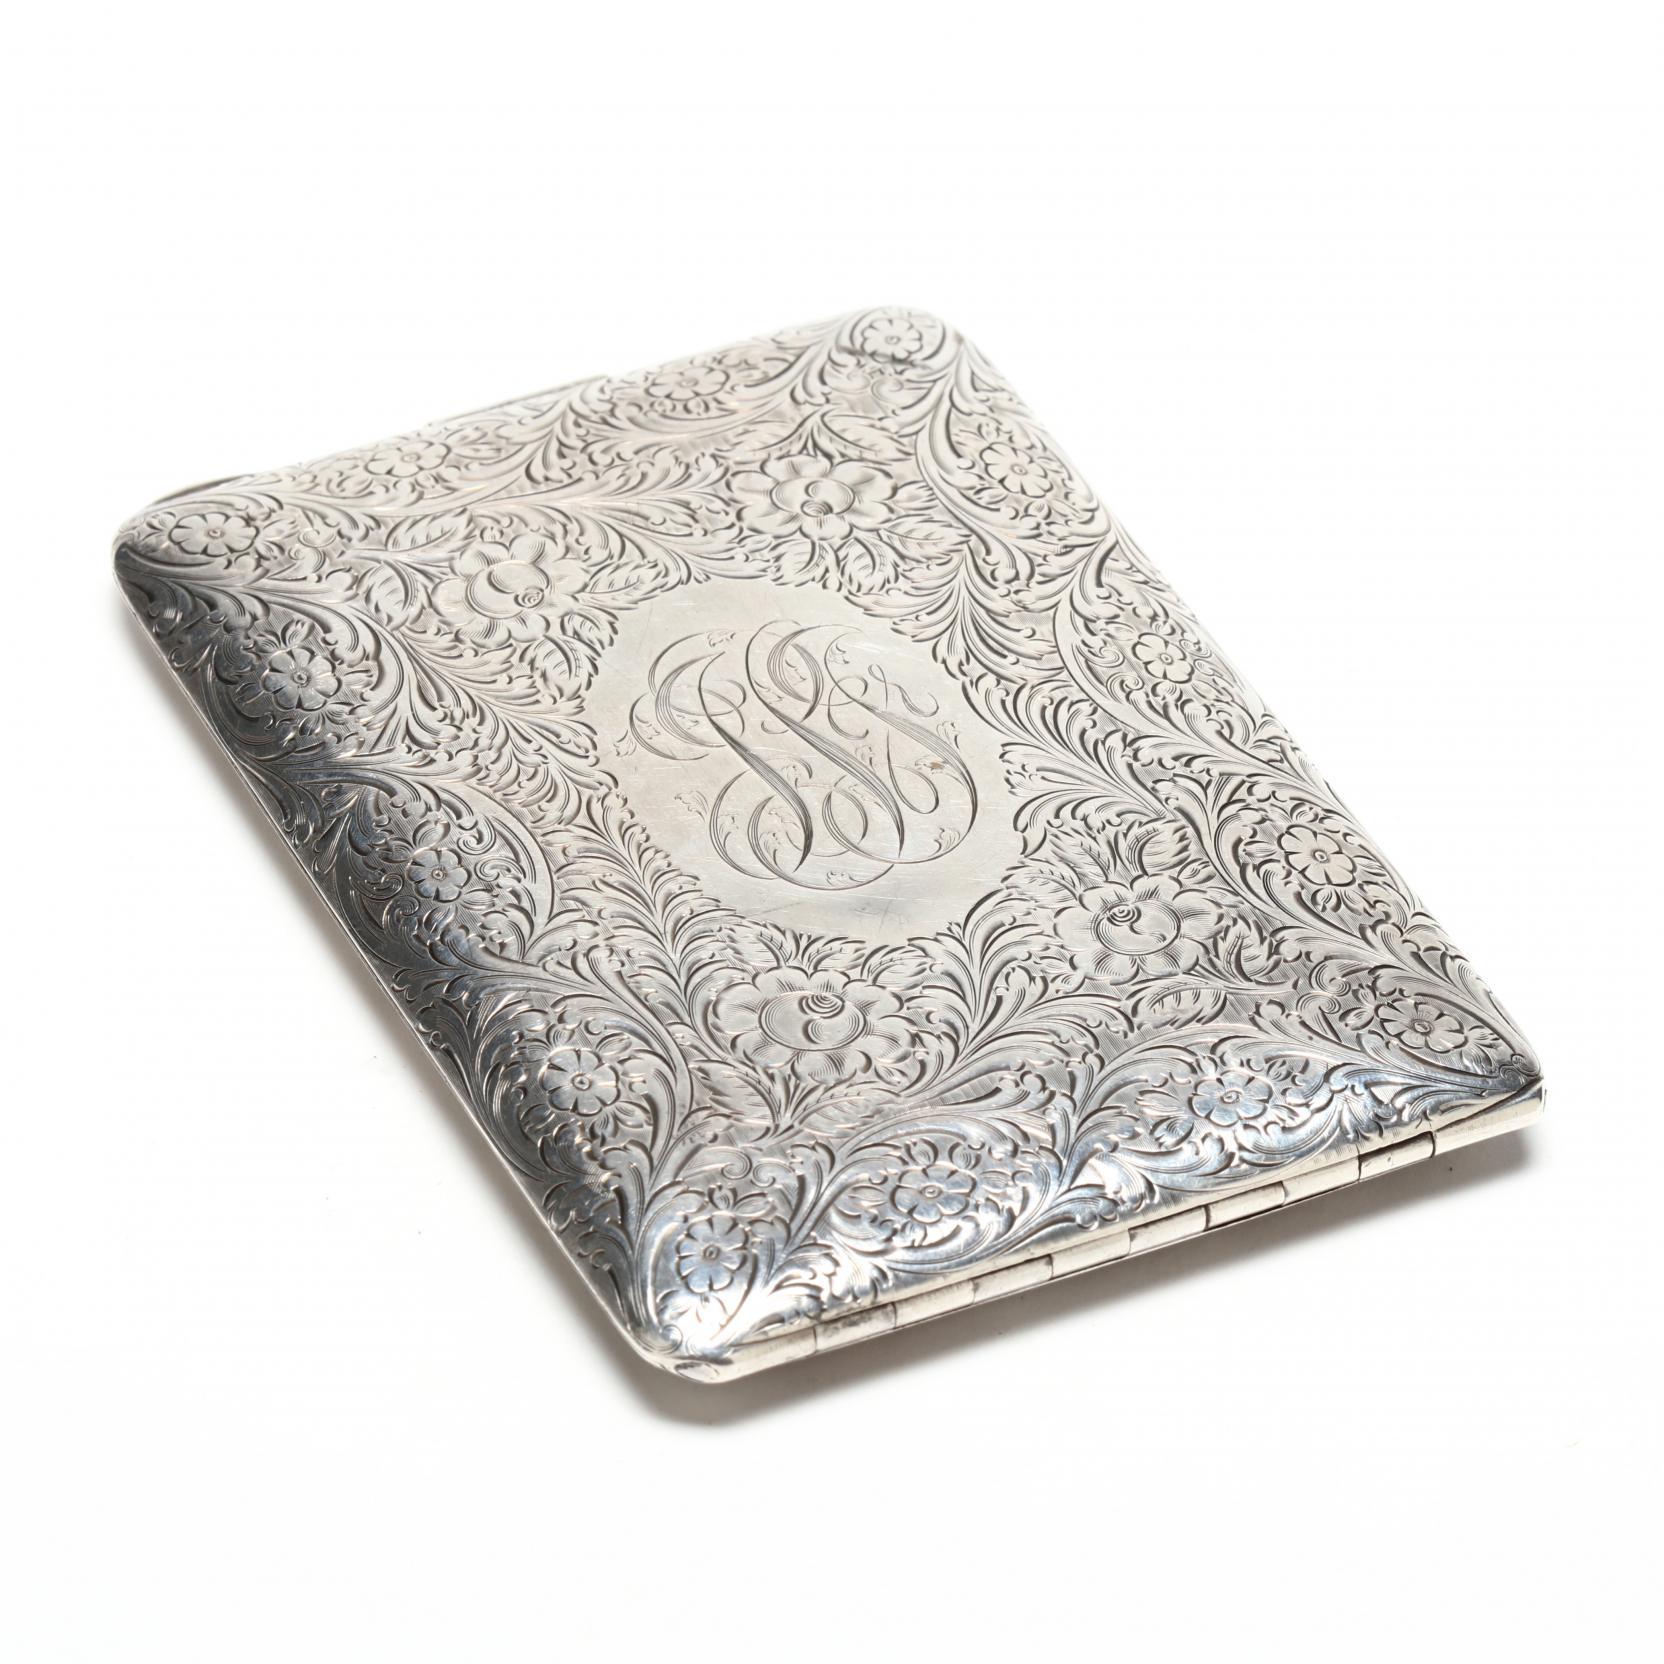 an-antique-sterling-silver-cigarette-case